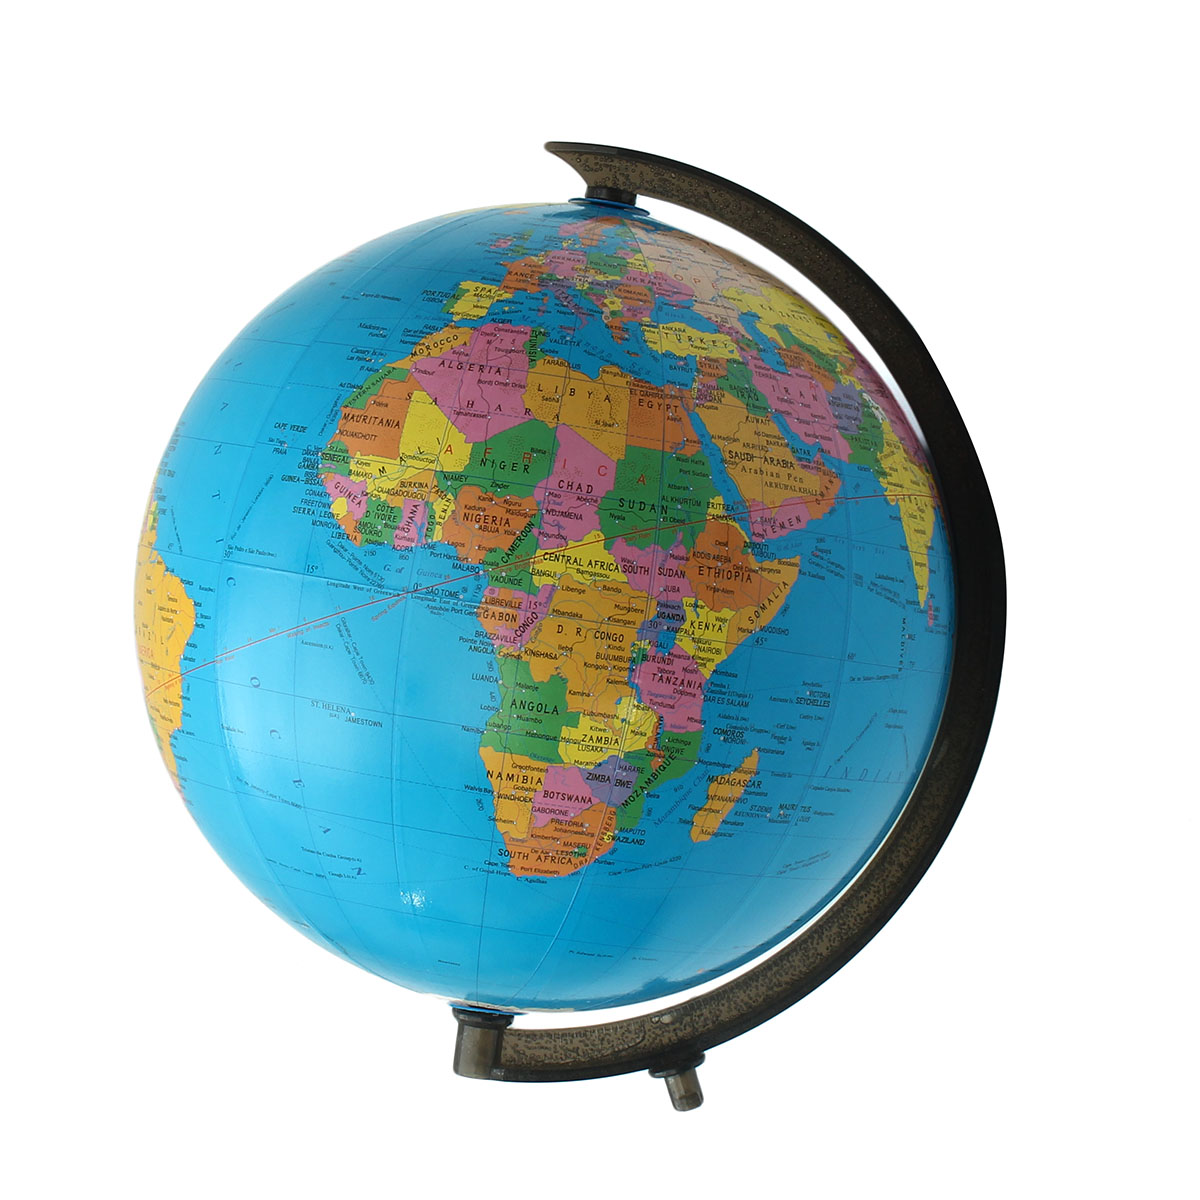 description material pvc polyvinyl chloride ps polystyrene total height approx 50cm 197 globe diameter approx 32cm 126